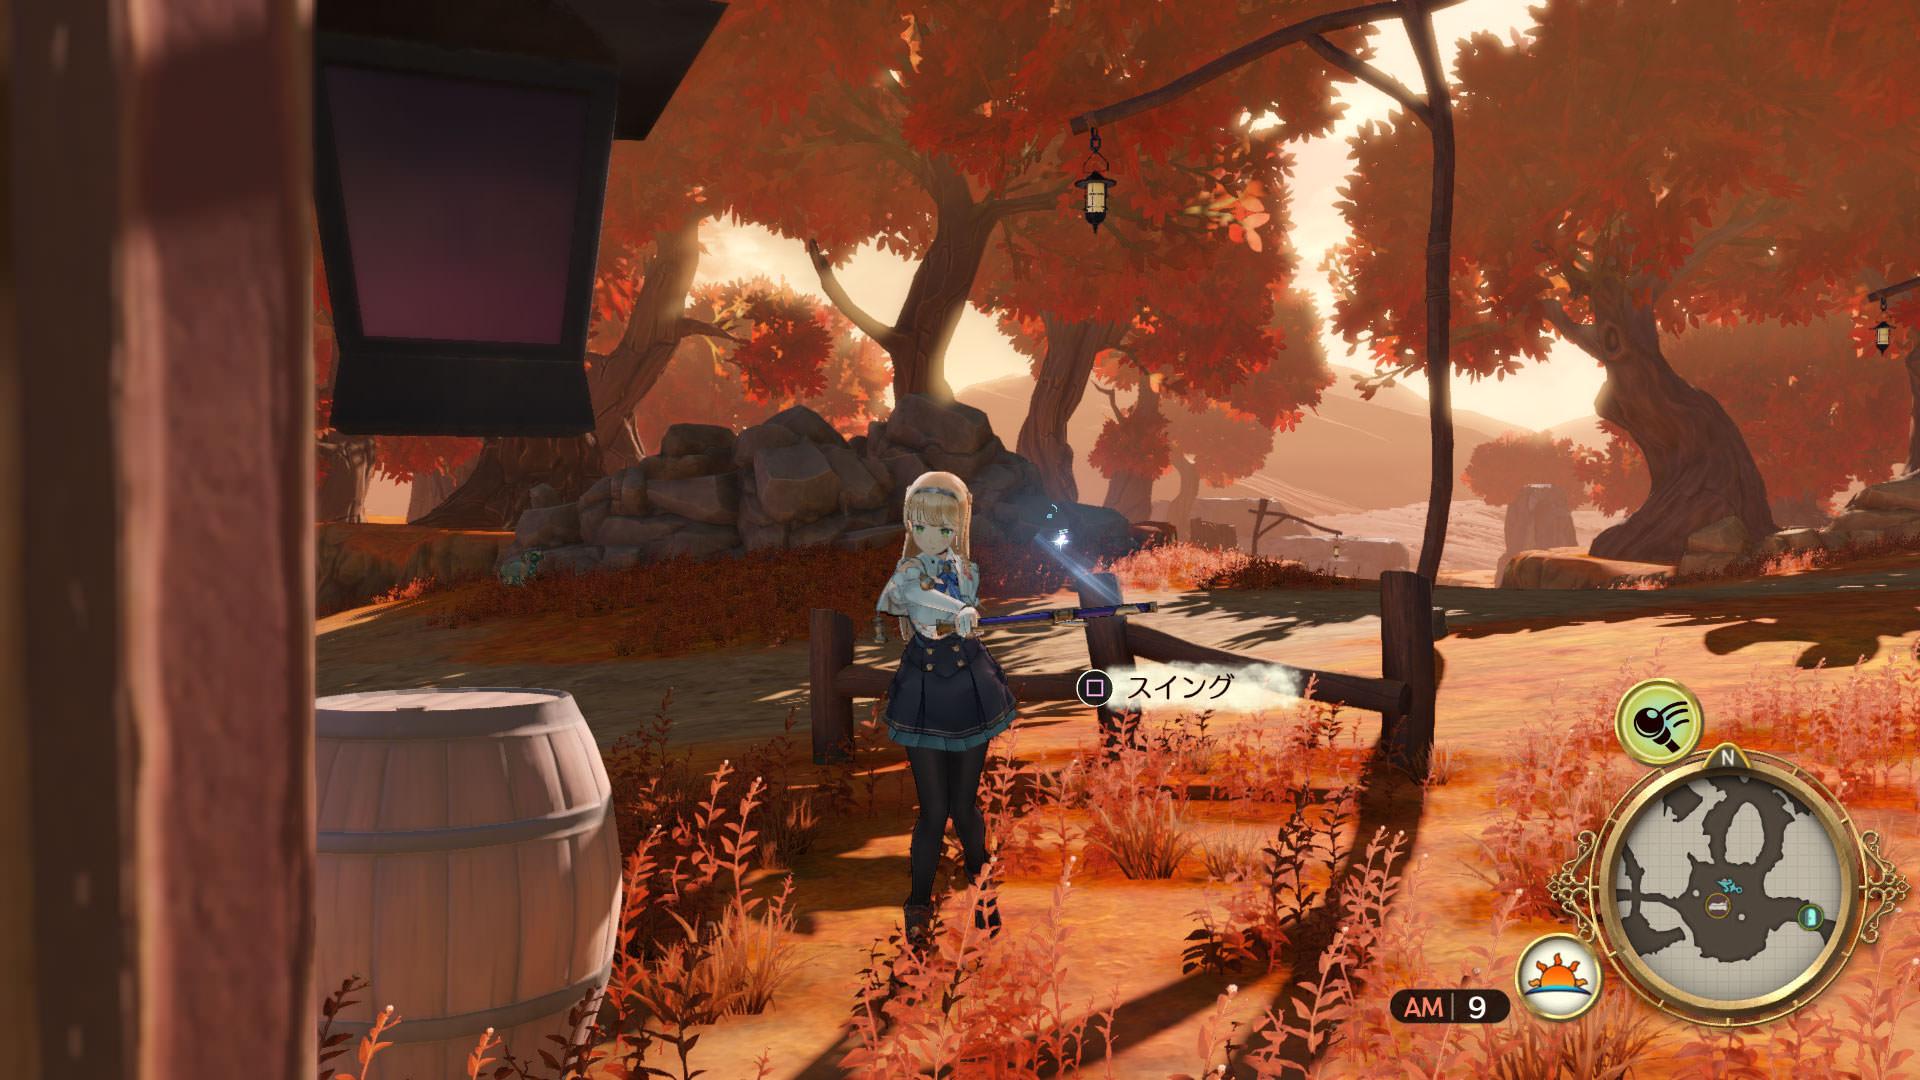 Atelier Ryza Update DLC